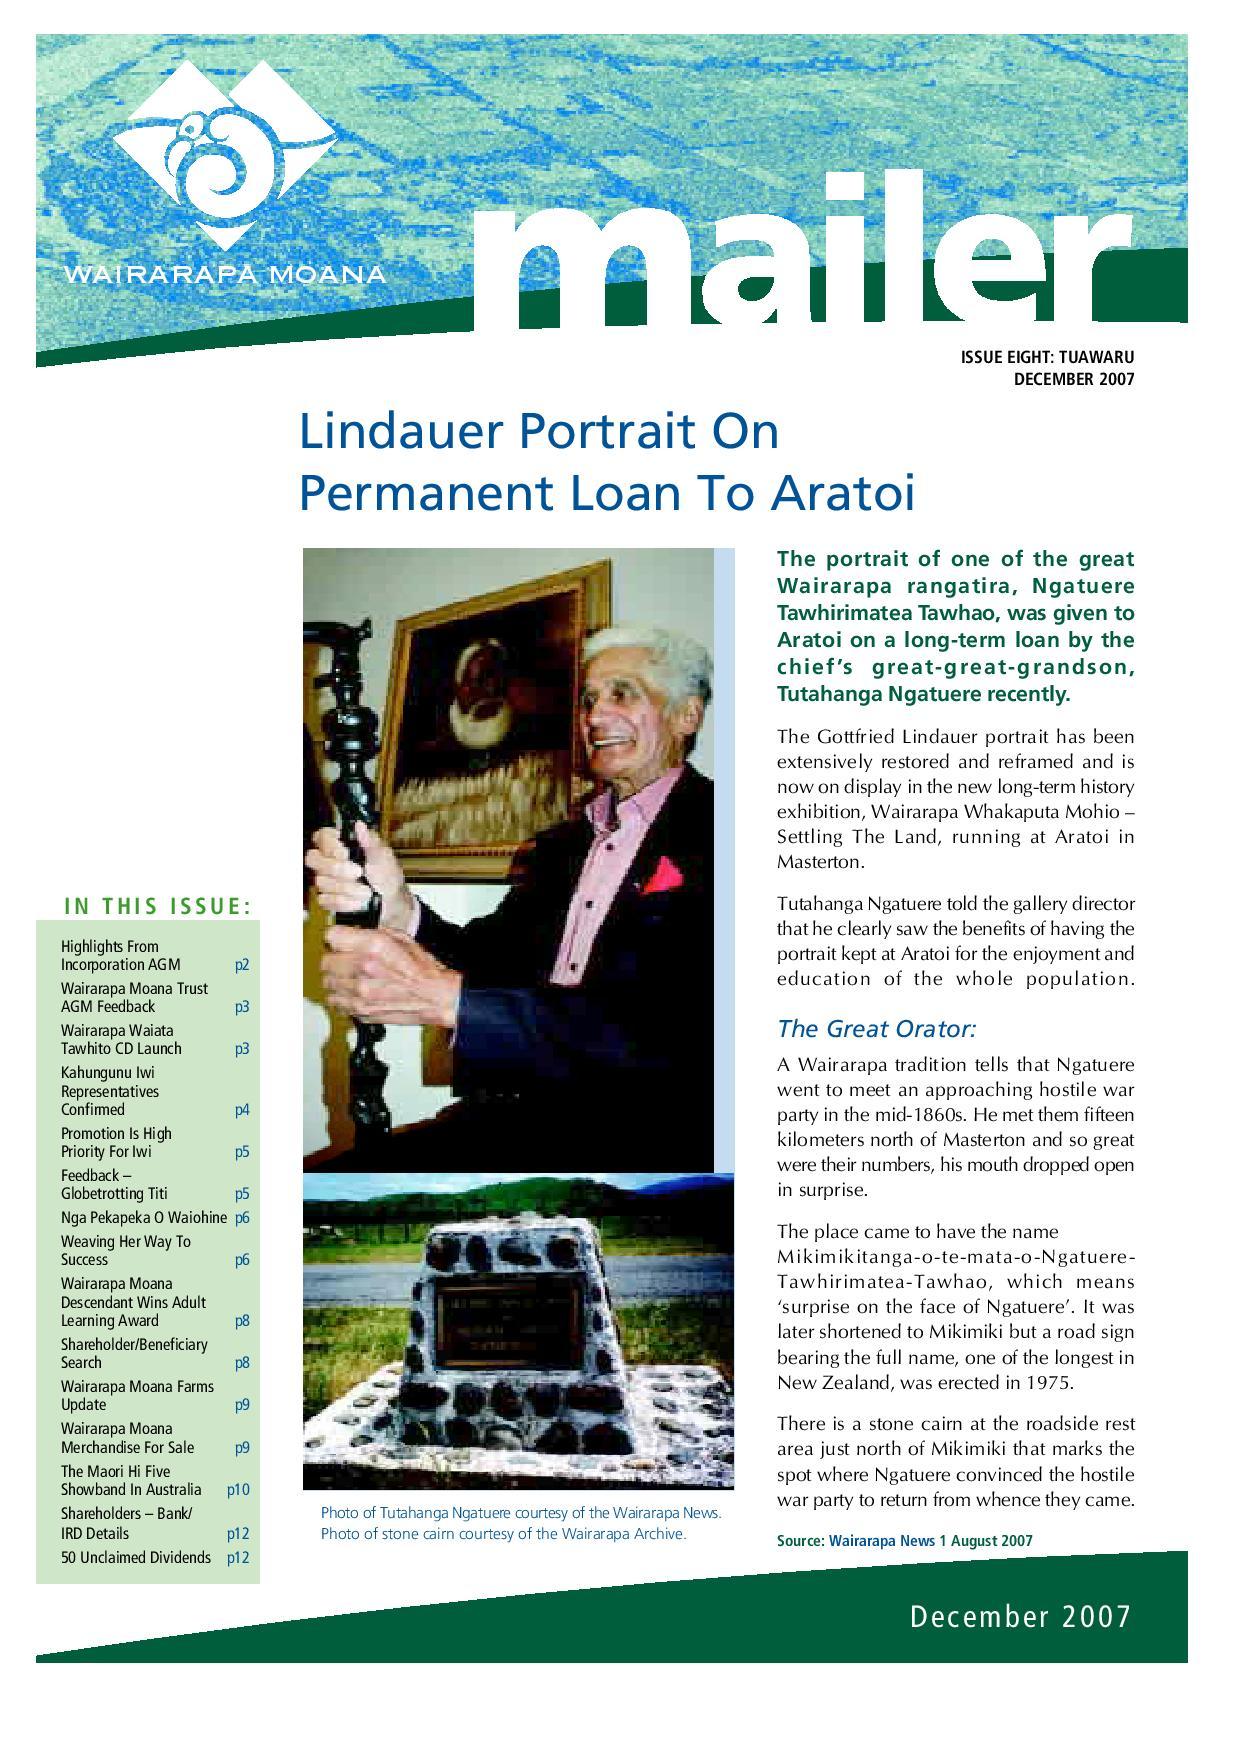 Issue 8 December 2007